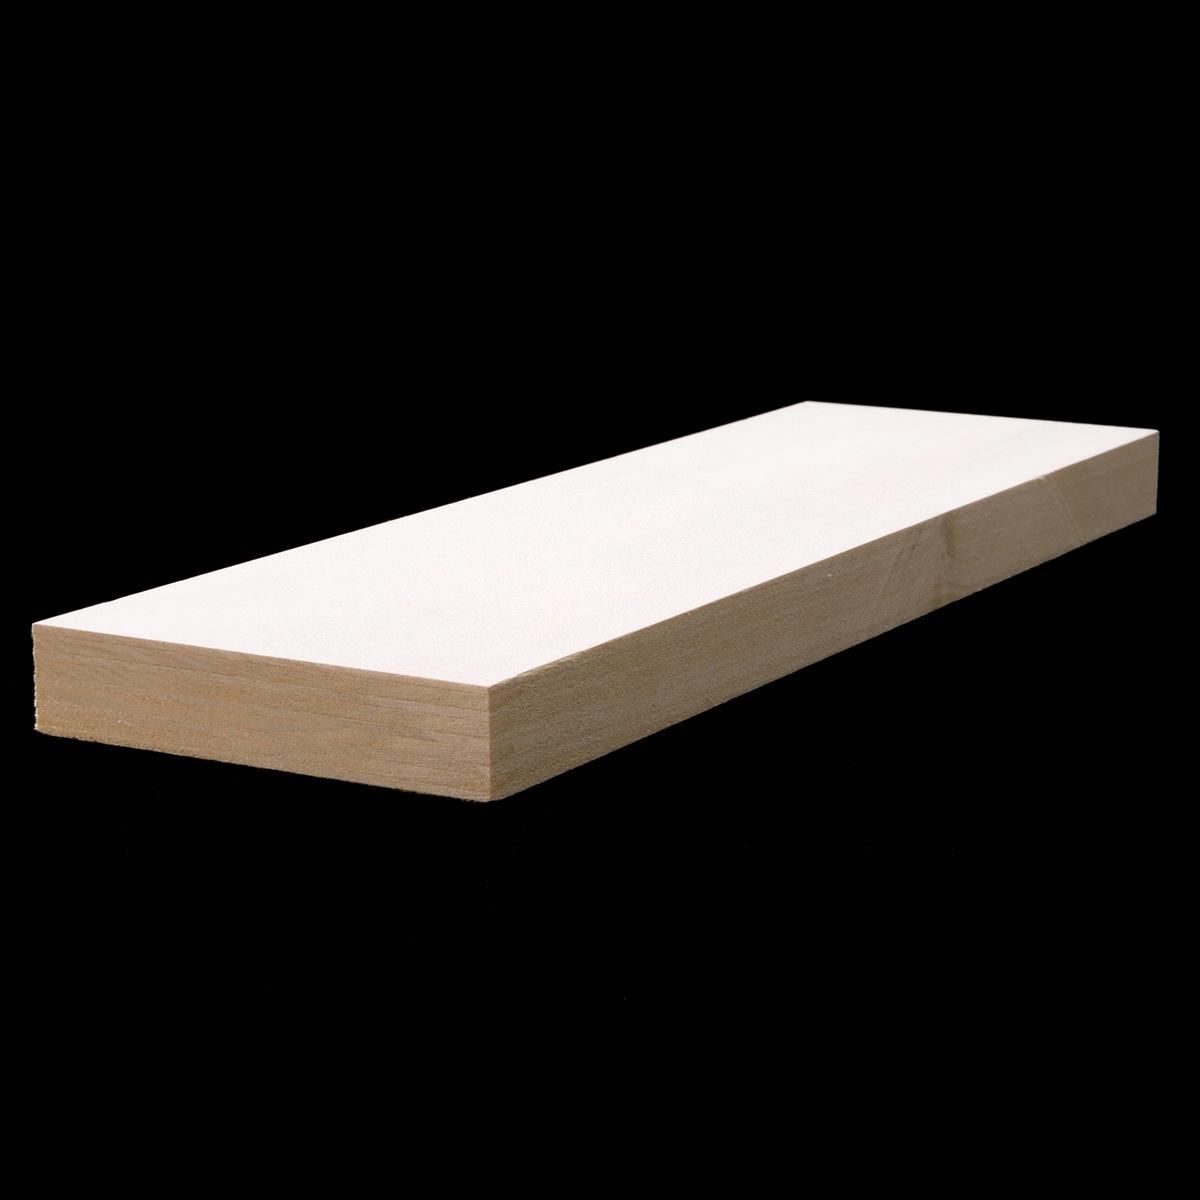 1x4 3 4 Quot X 3 1 2 Quot F J Primed Poplar S4s Lumber Boards